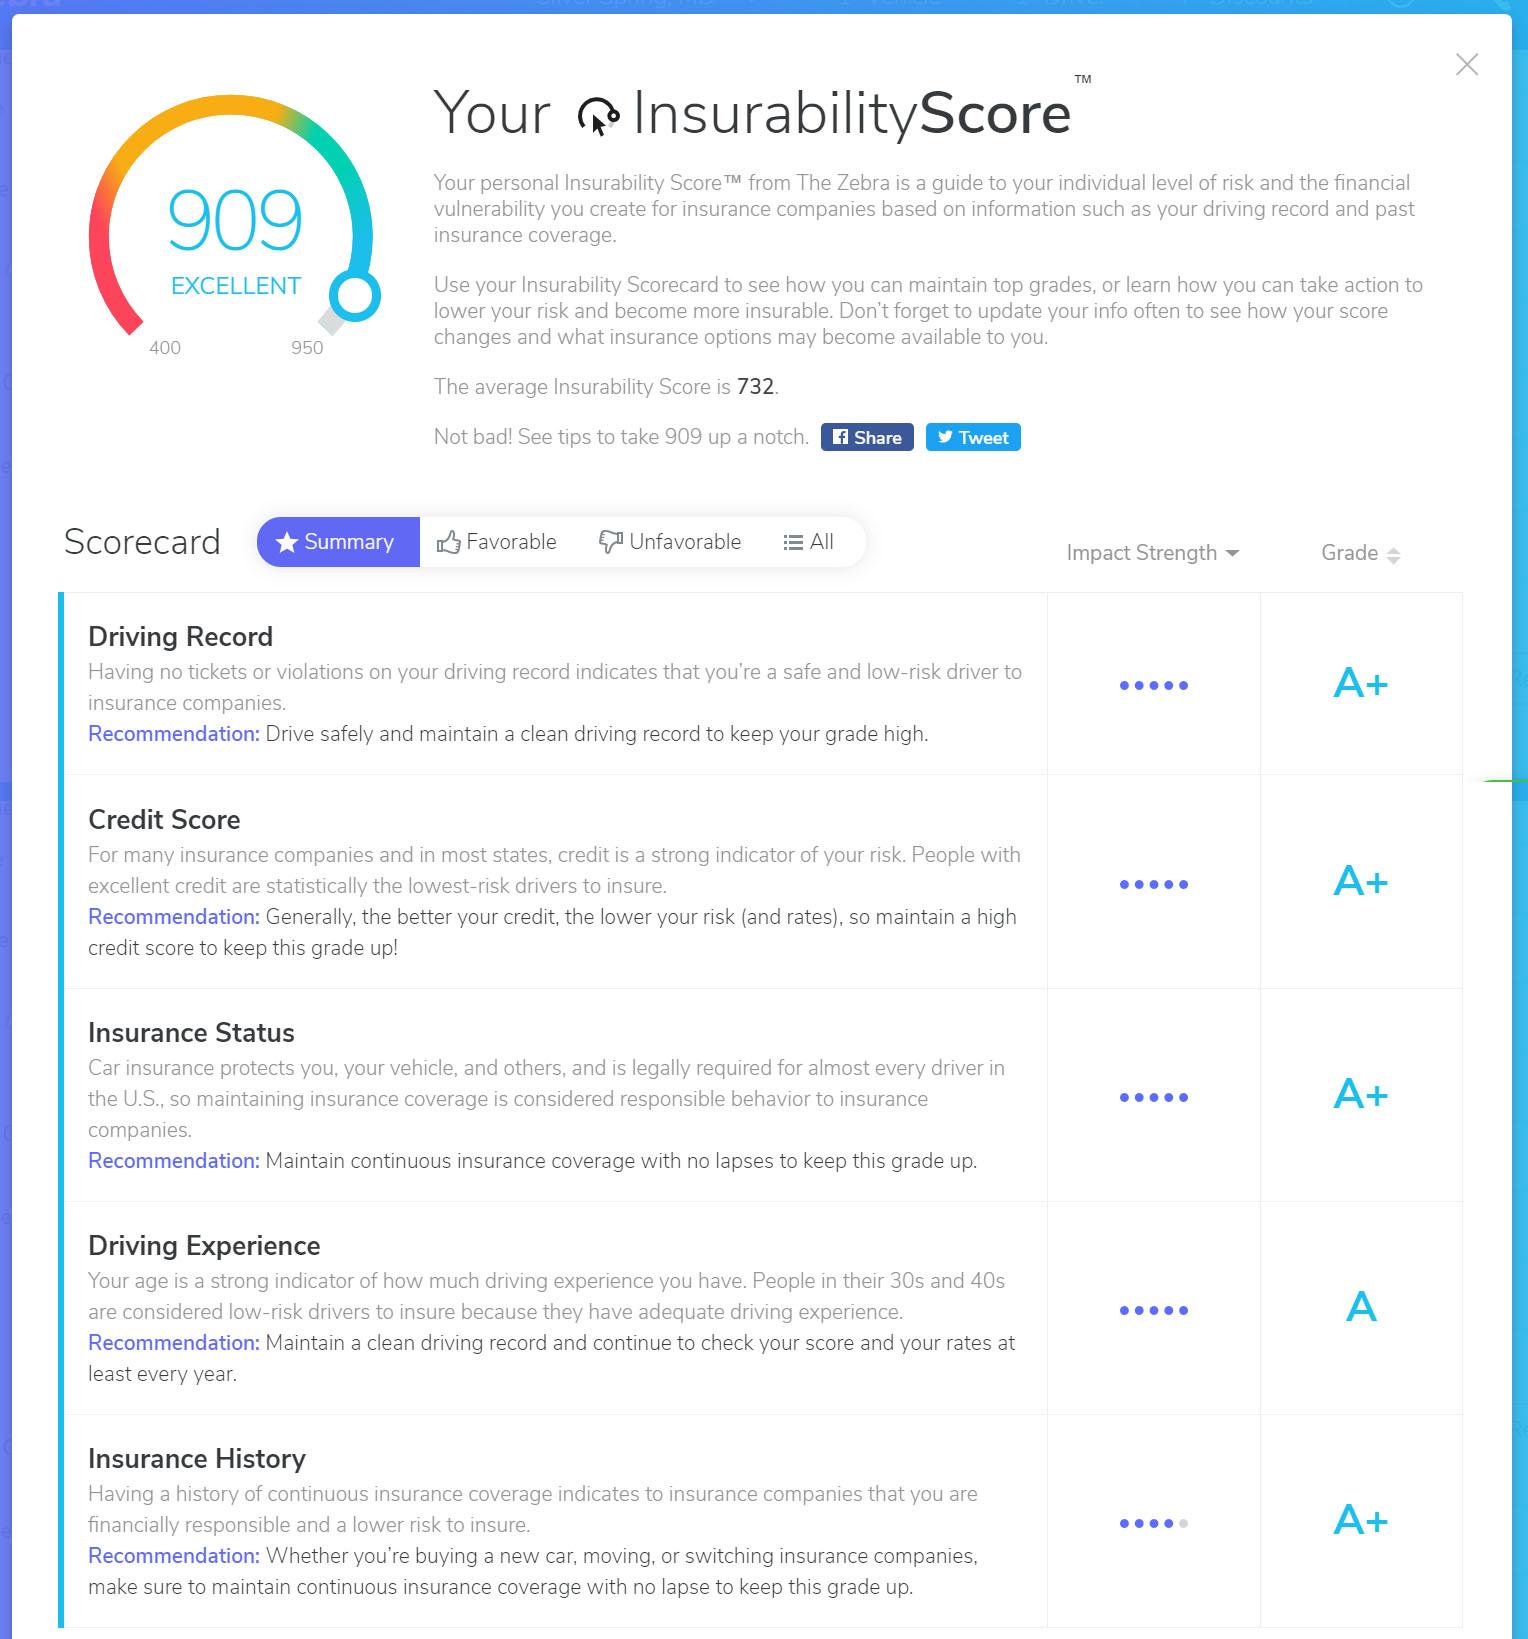 zebra insurability score report